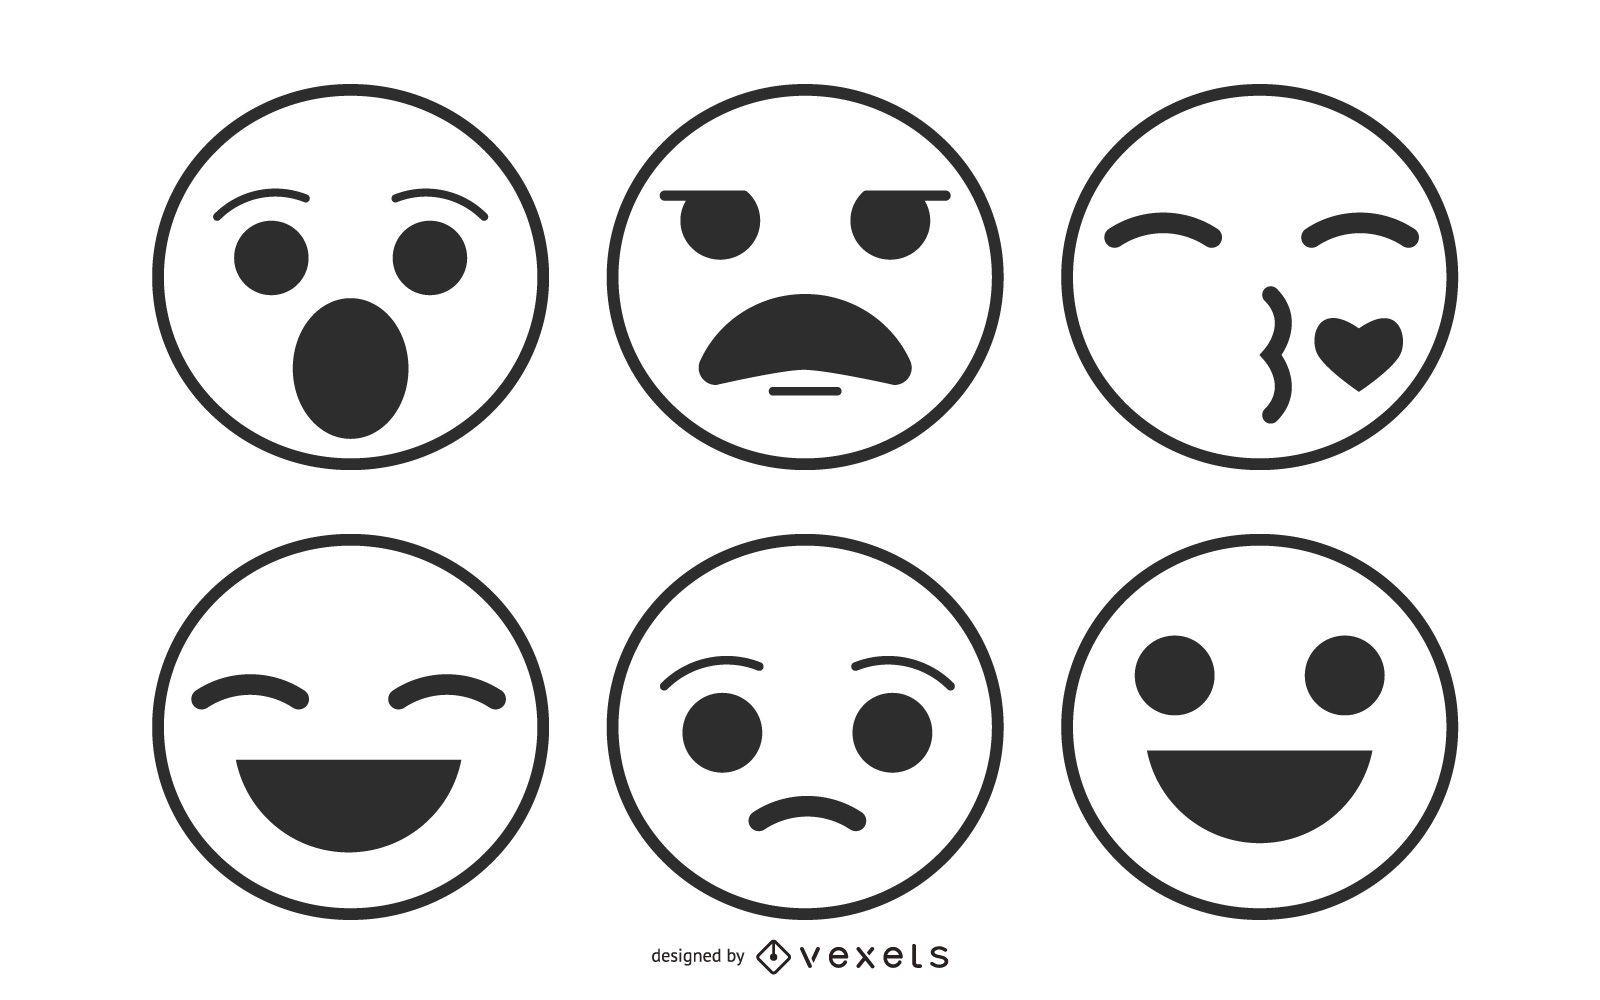 Line Art Emoticons Pack